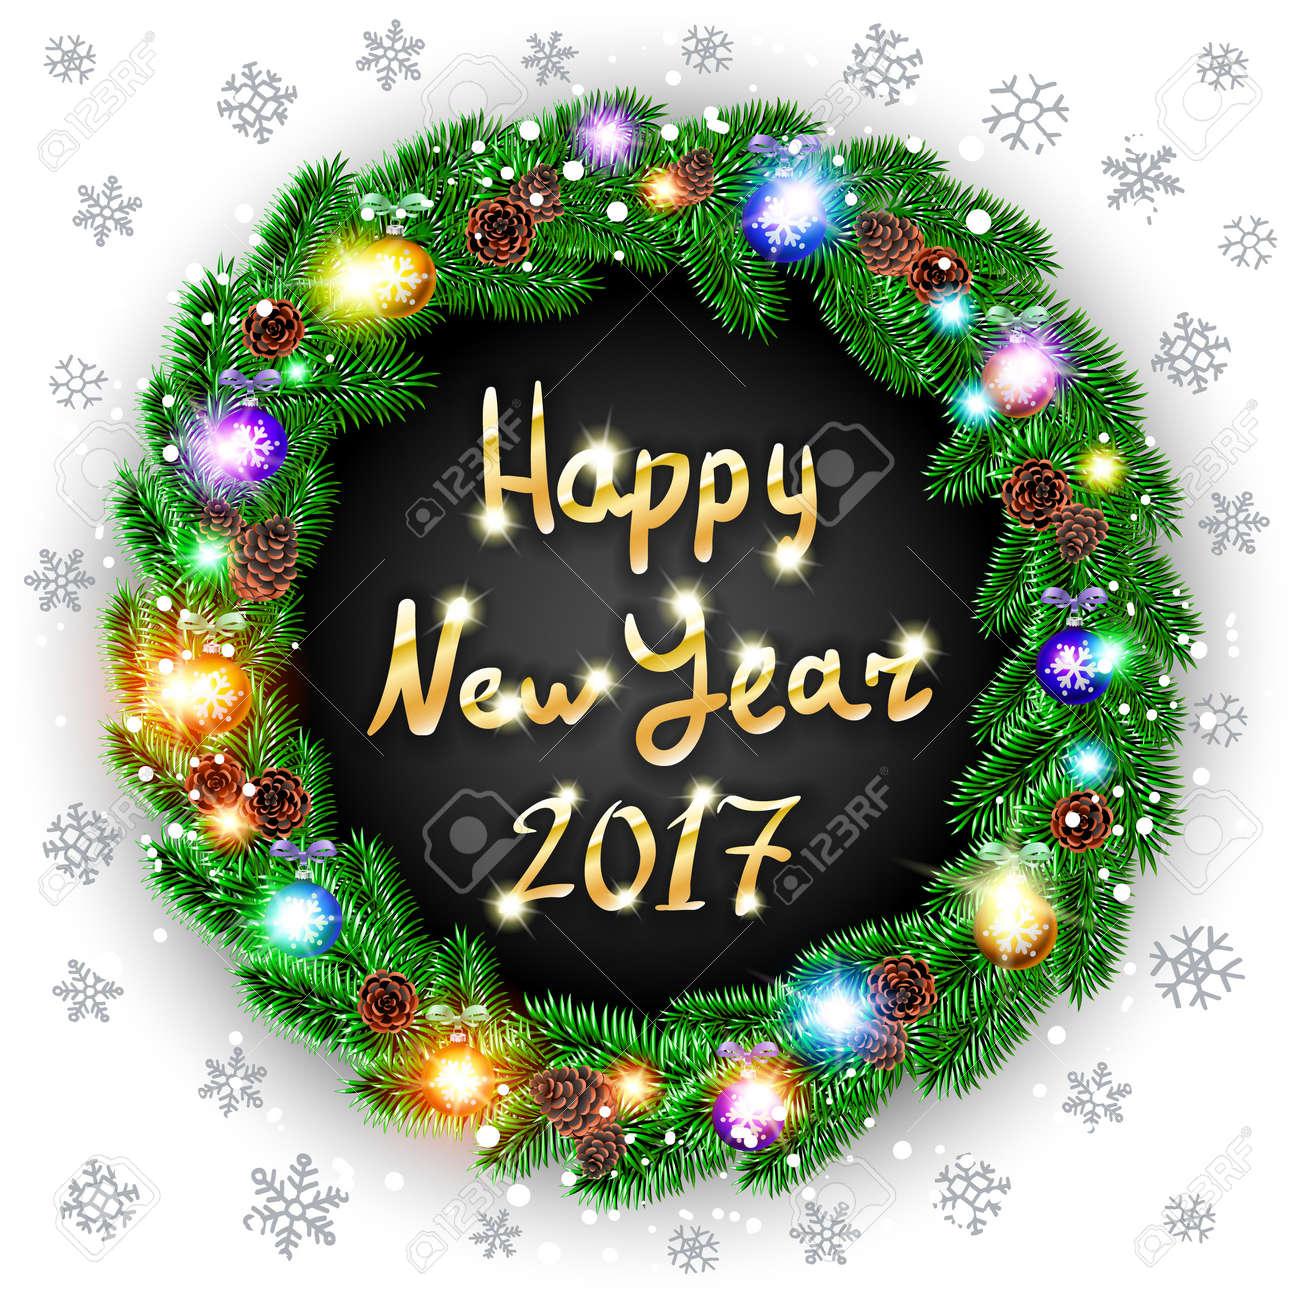 vector vector christmas happy new year 2017 green wreath background snow light art